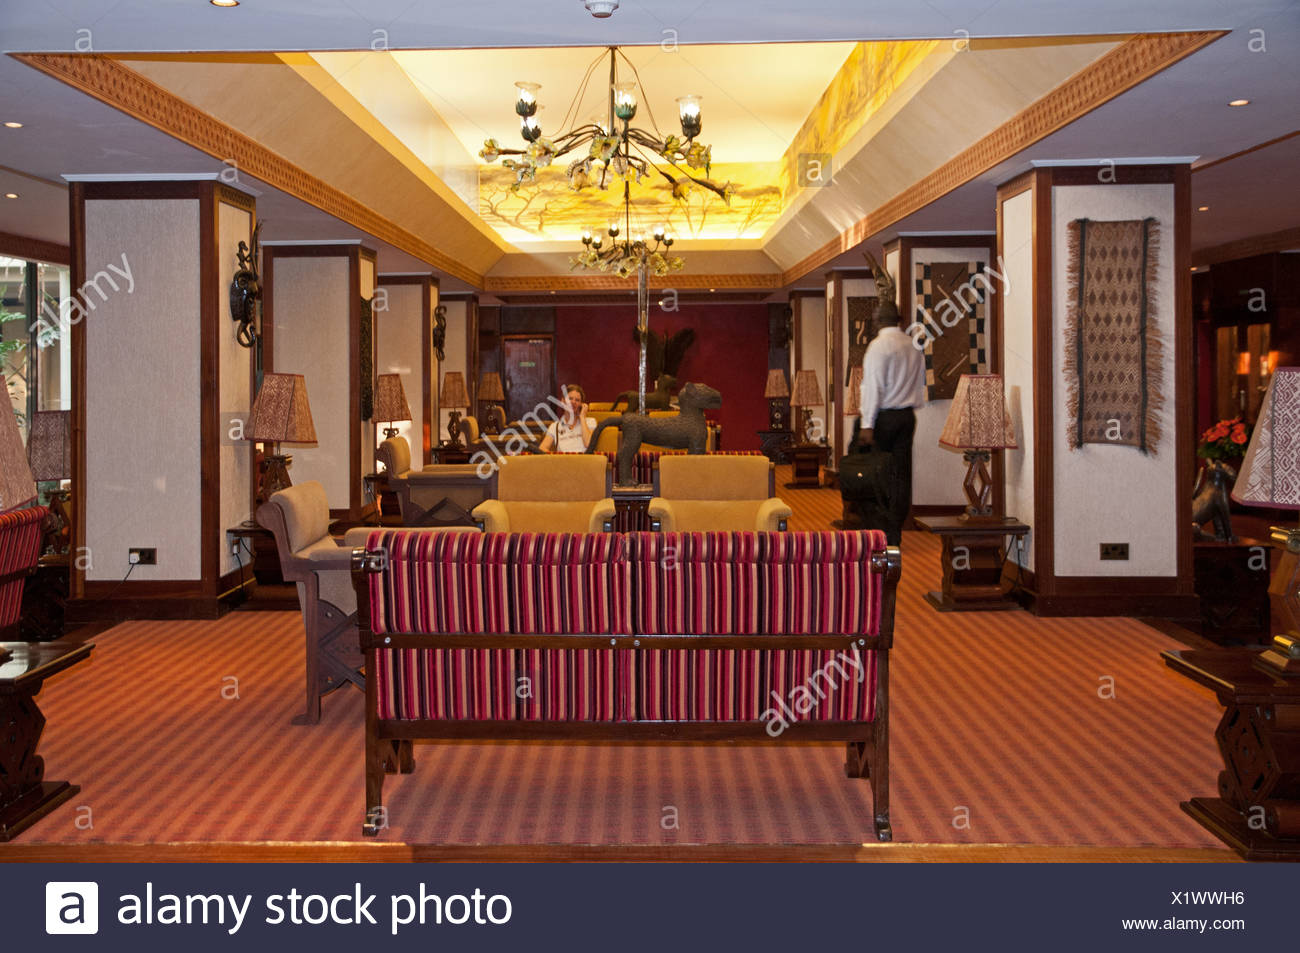 Inside the lobby of the Nairobi Serena Hotel Nairobi Kenya - Stock Image